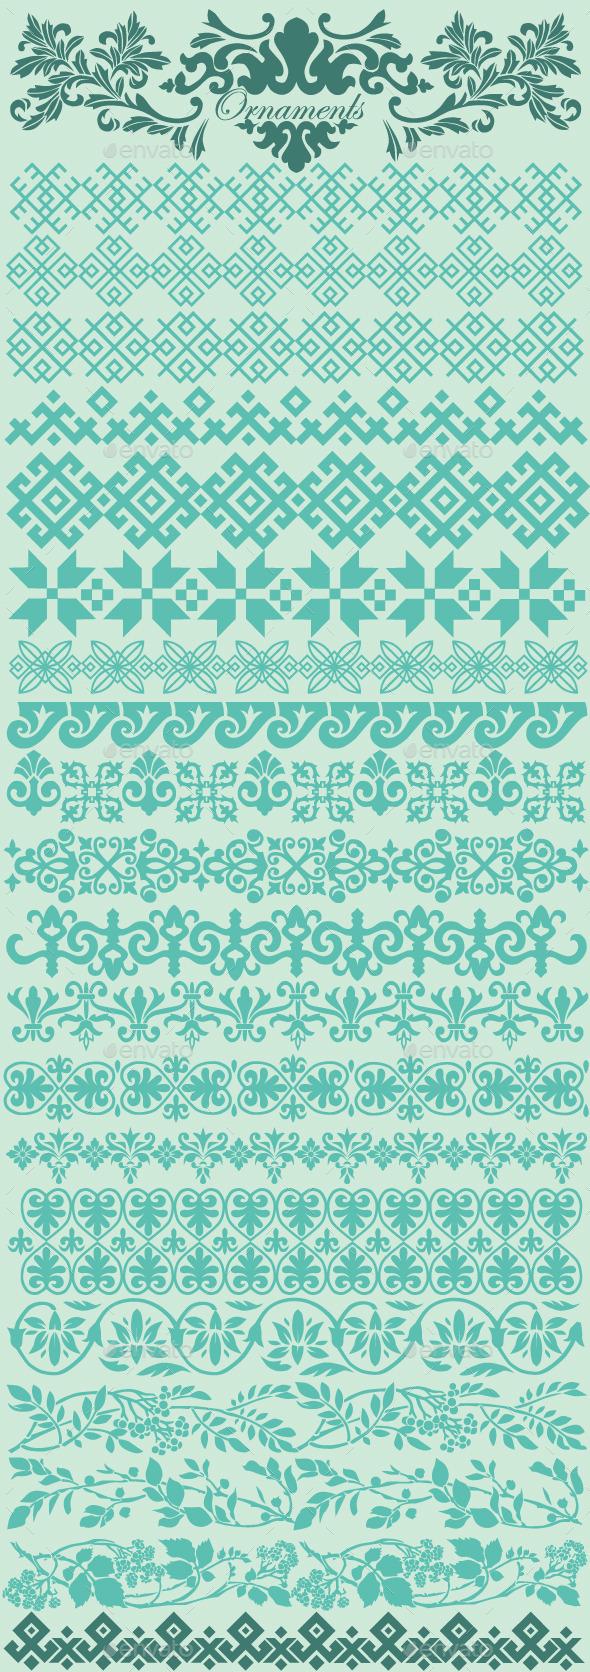 Ornaments - Flourishes / Swirls Decorative